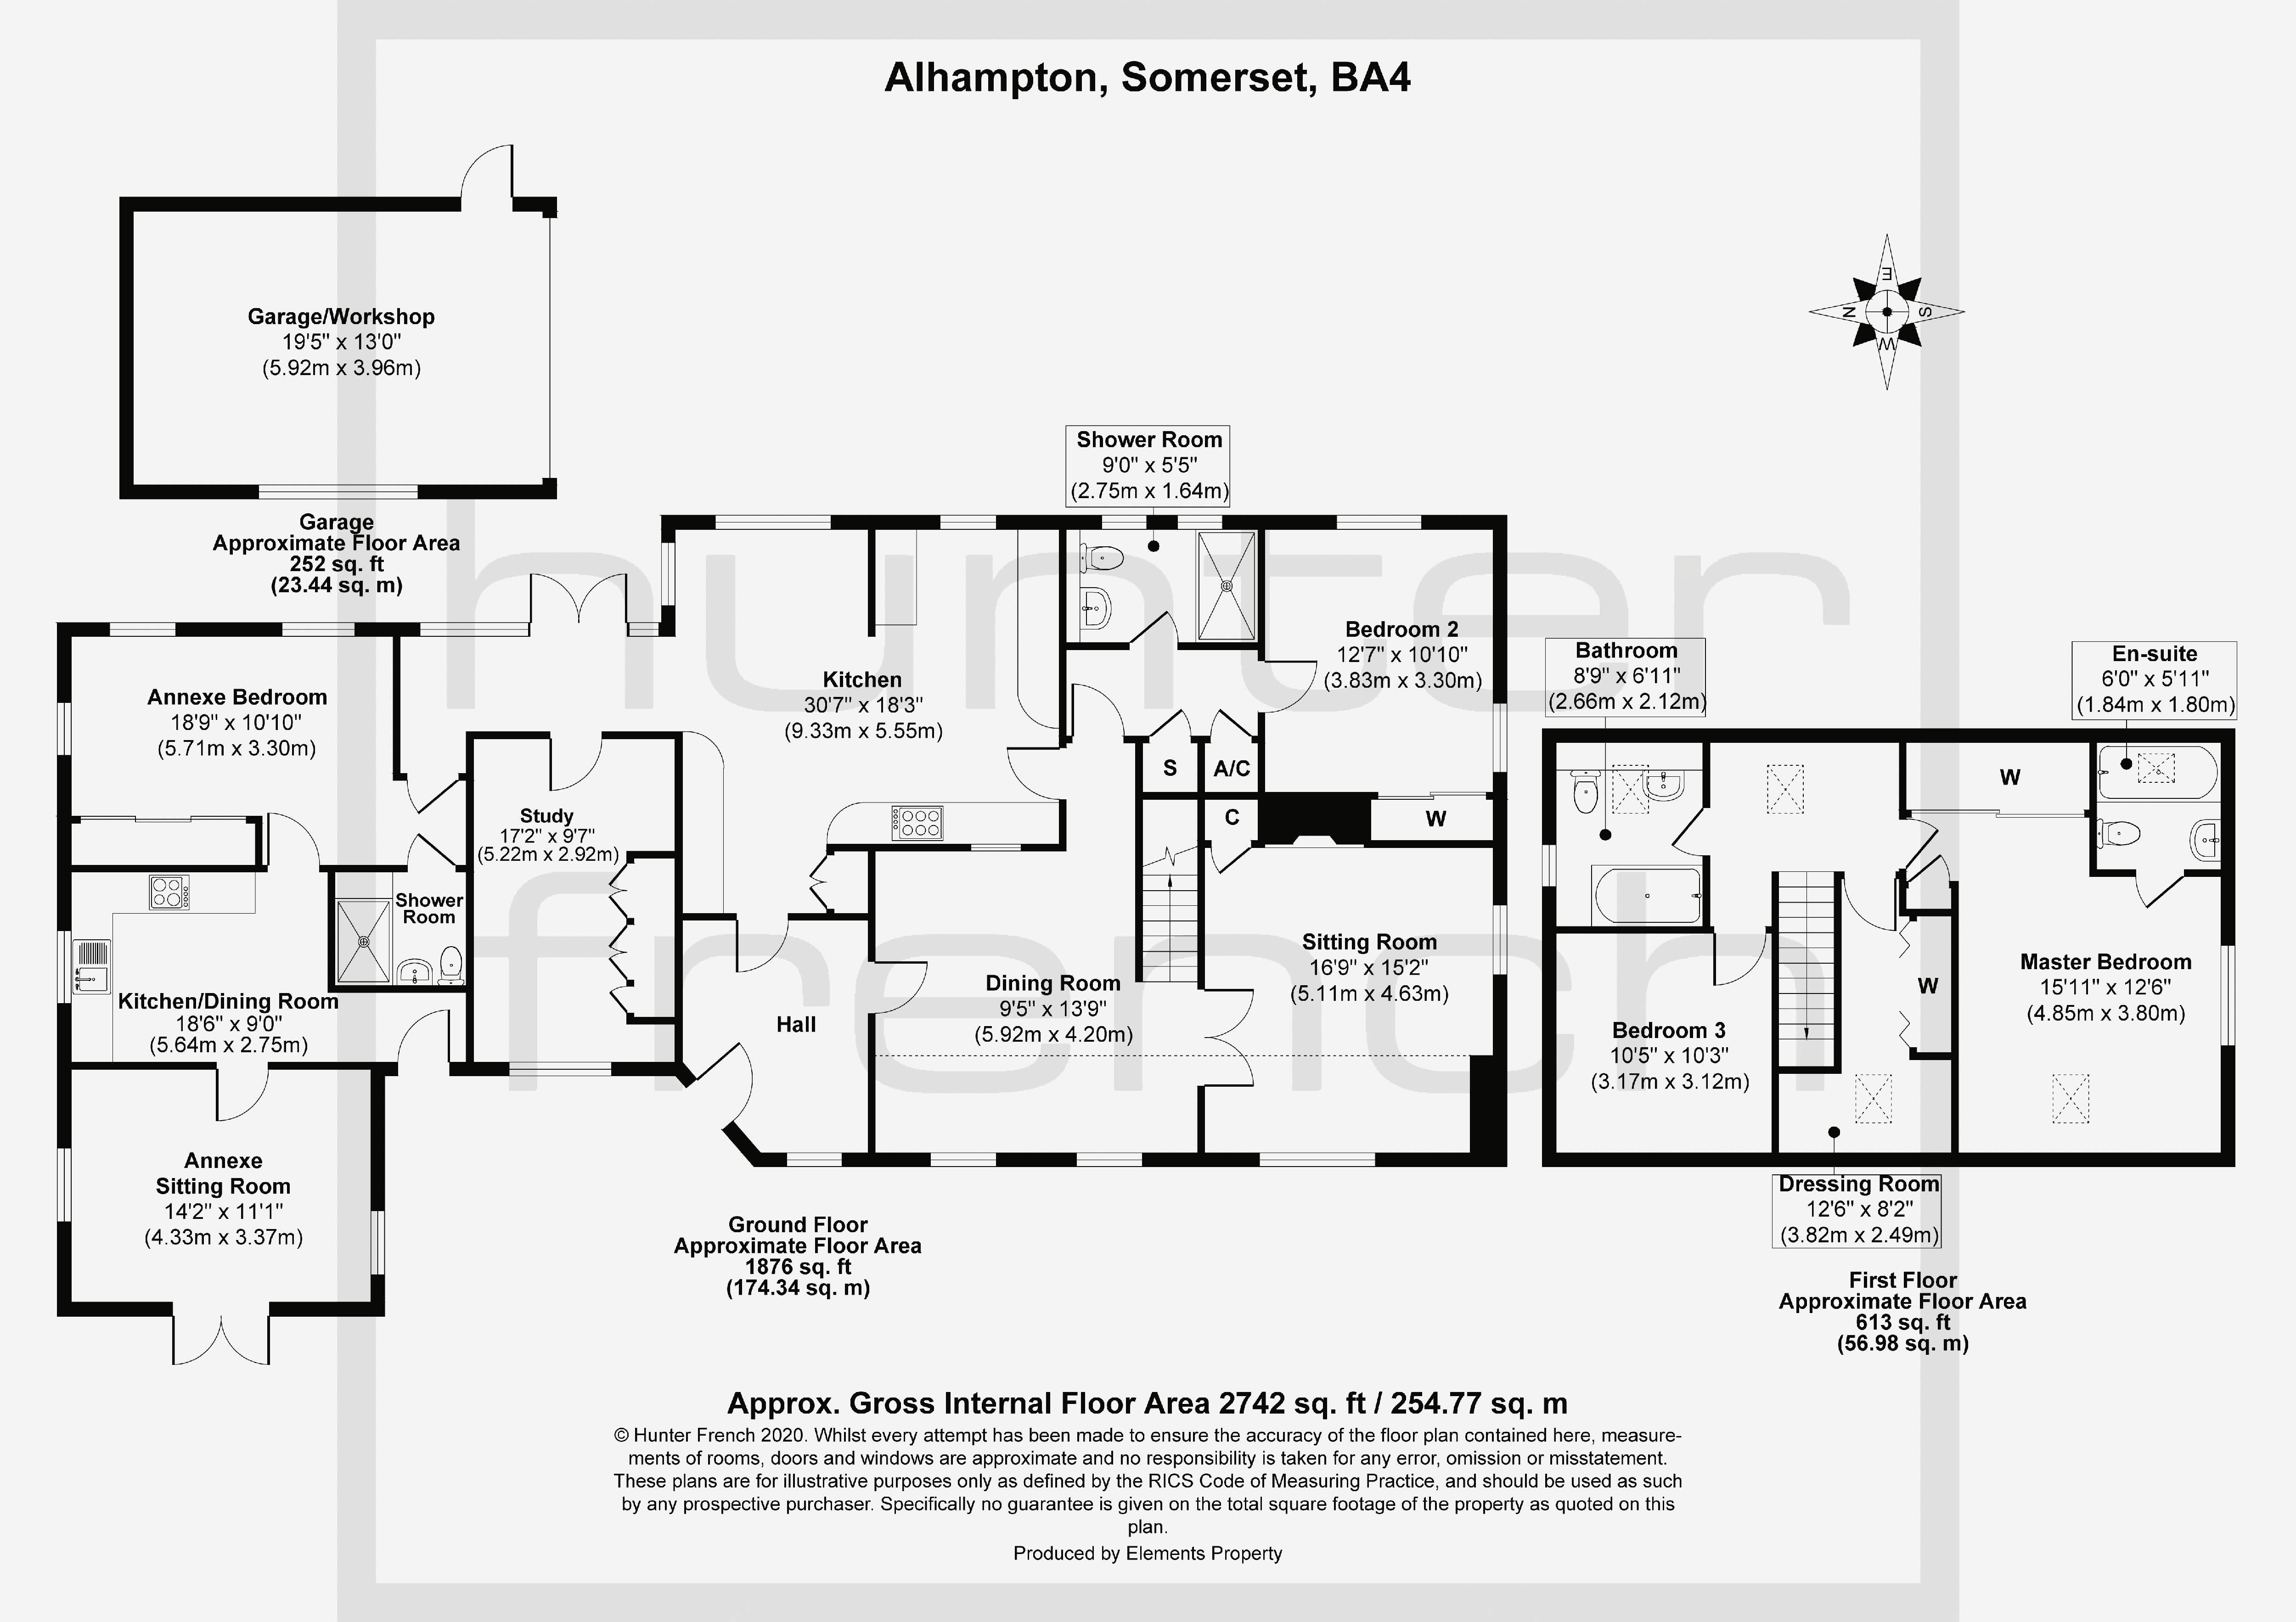 Millstones, Alhampton Floorplan (L)